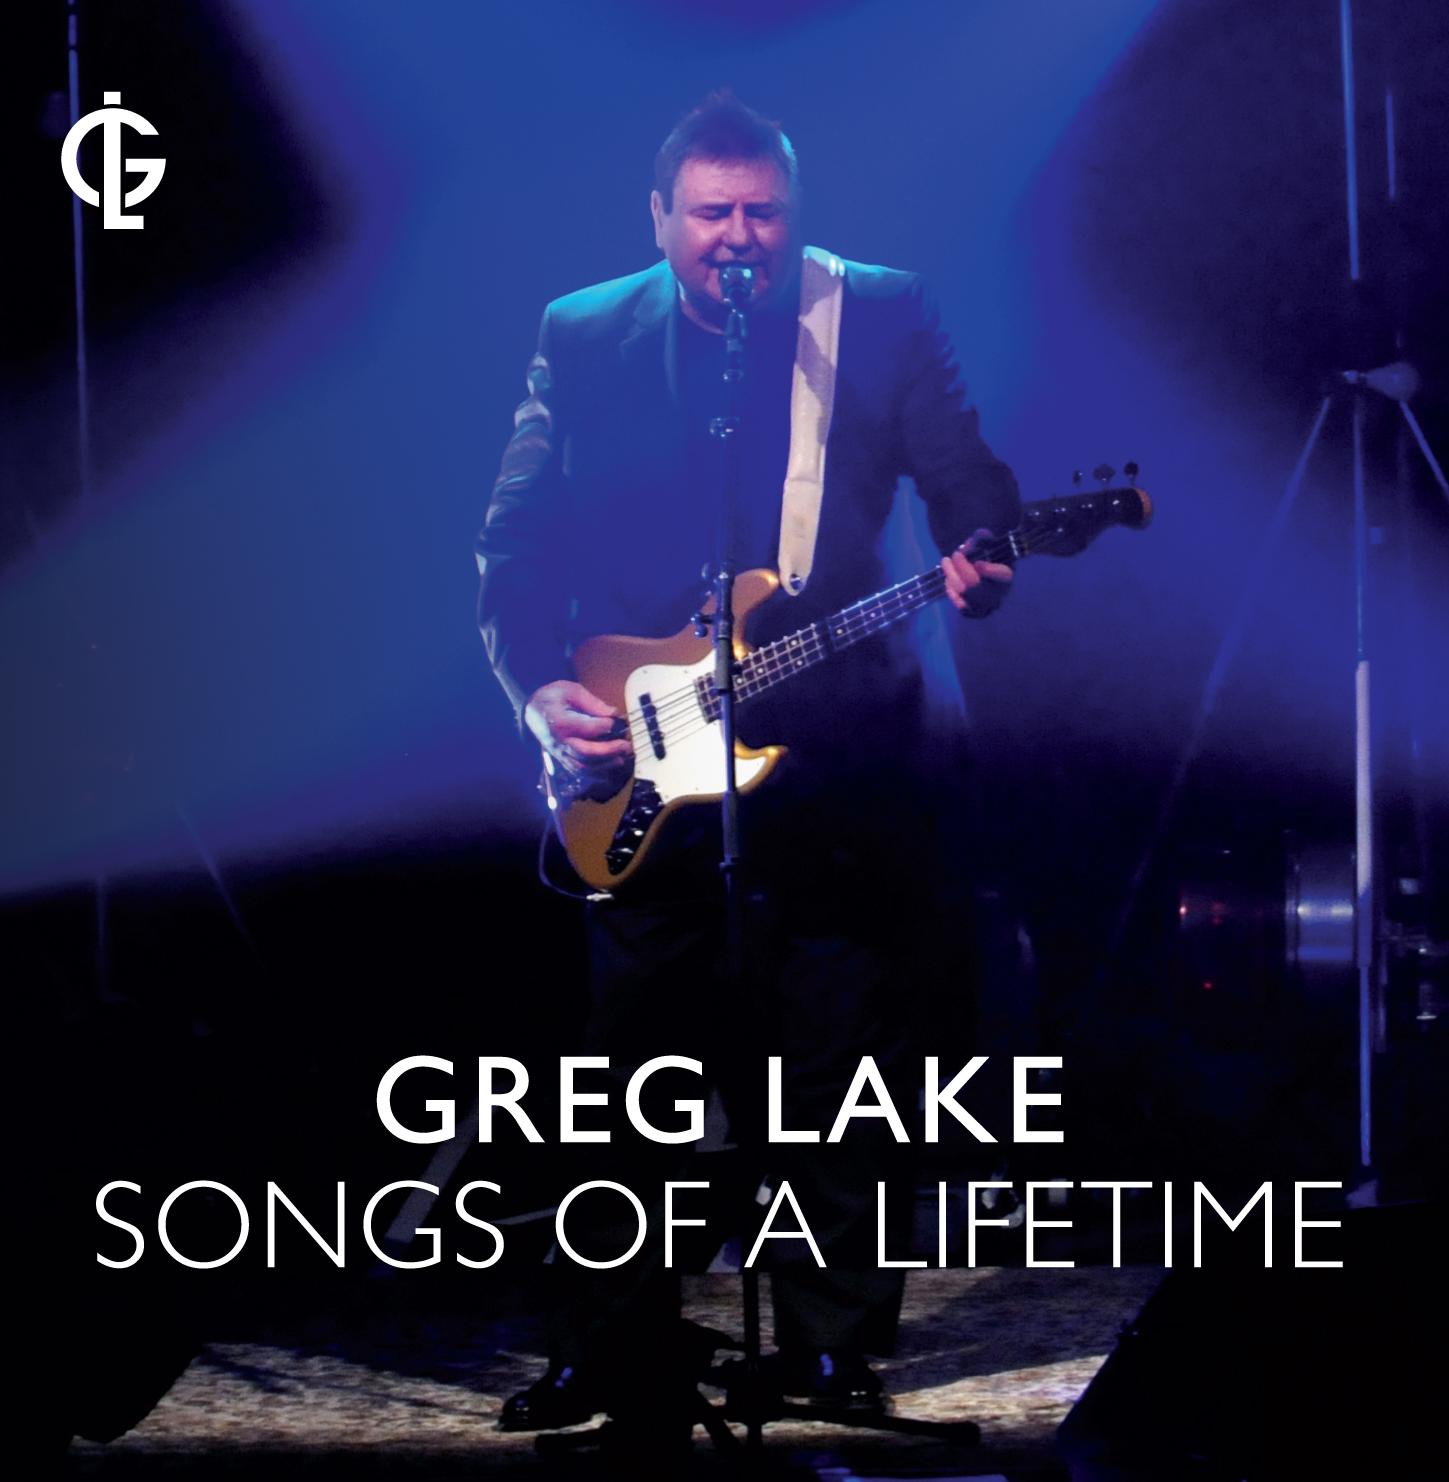 Greg Lake Songs of a Lifetime Cover